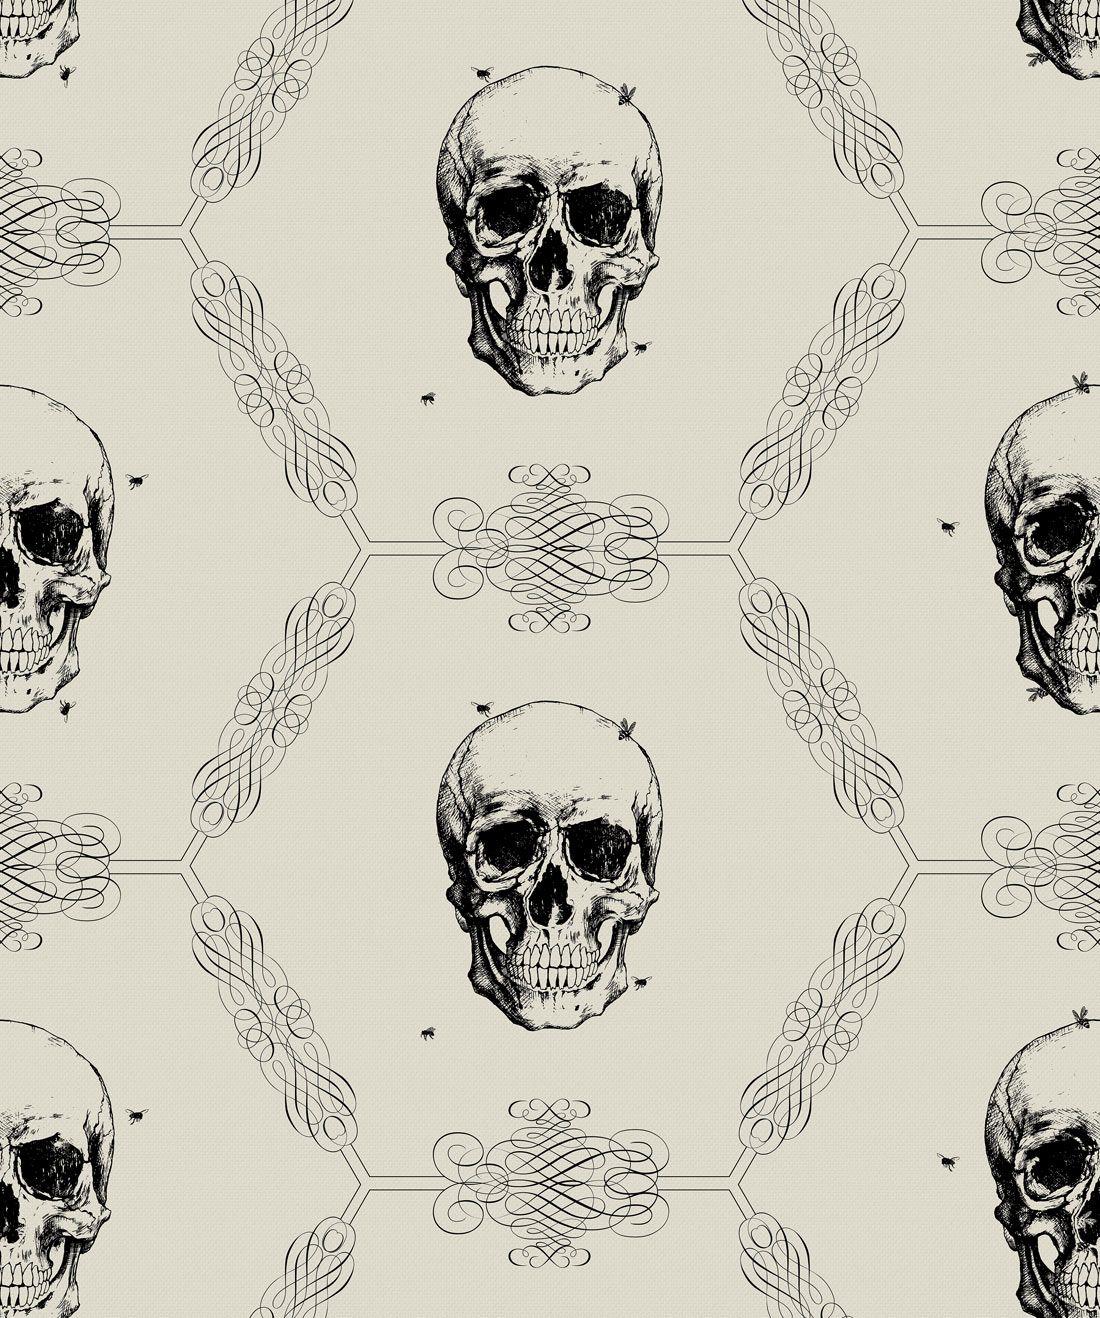 Skull and Bee Wallpaper